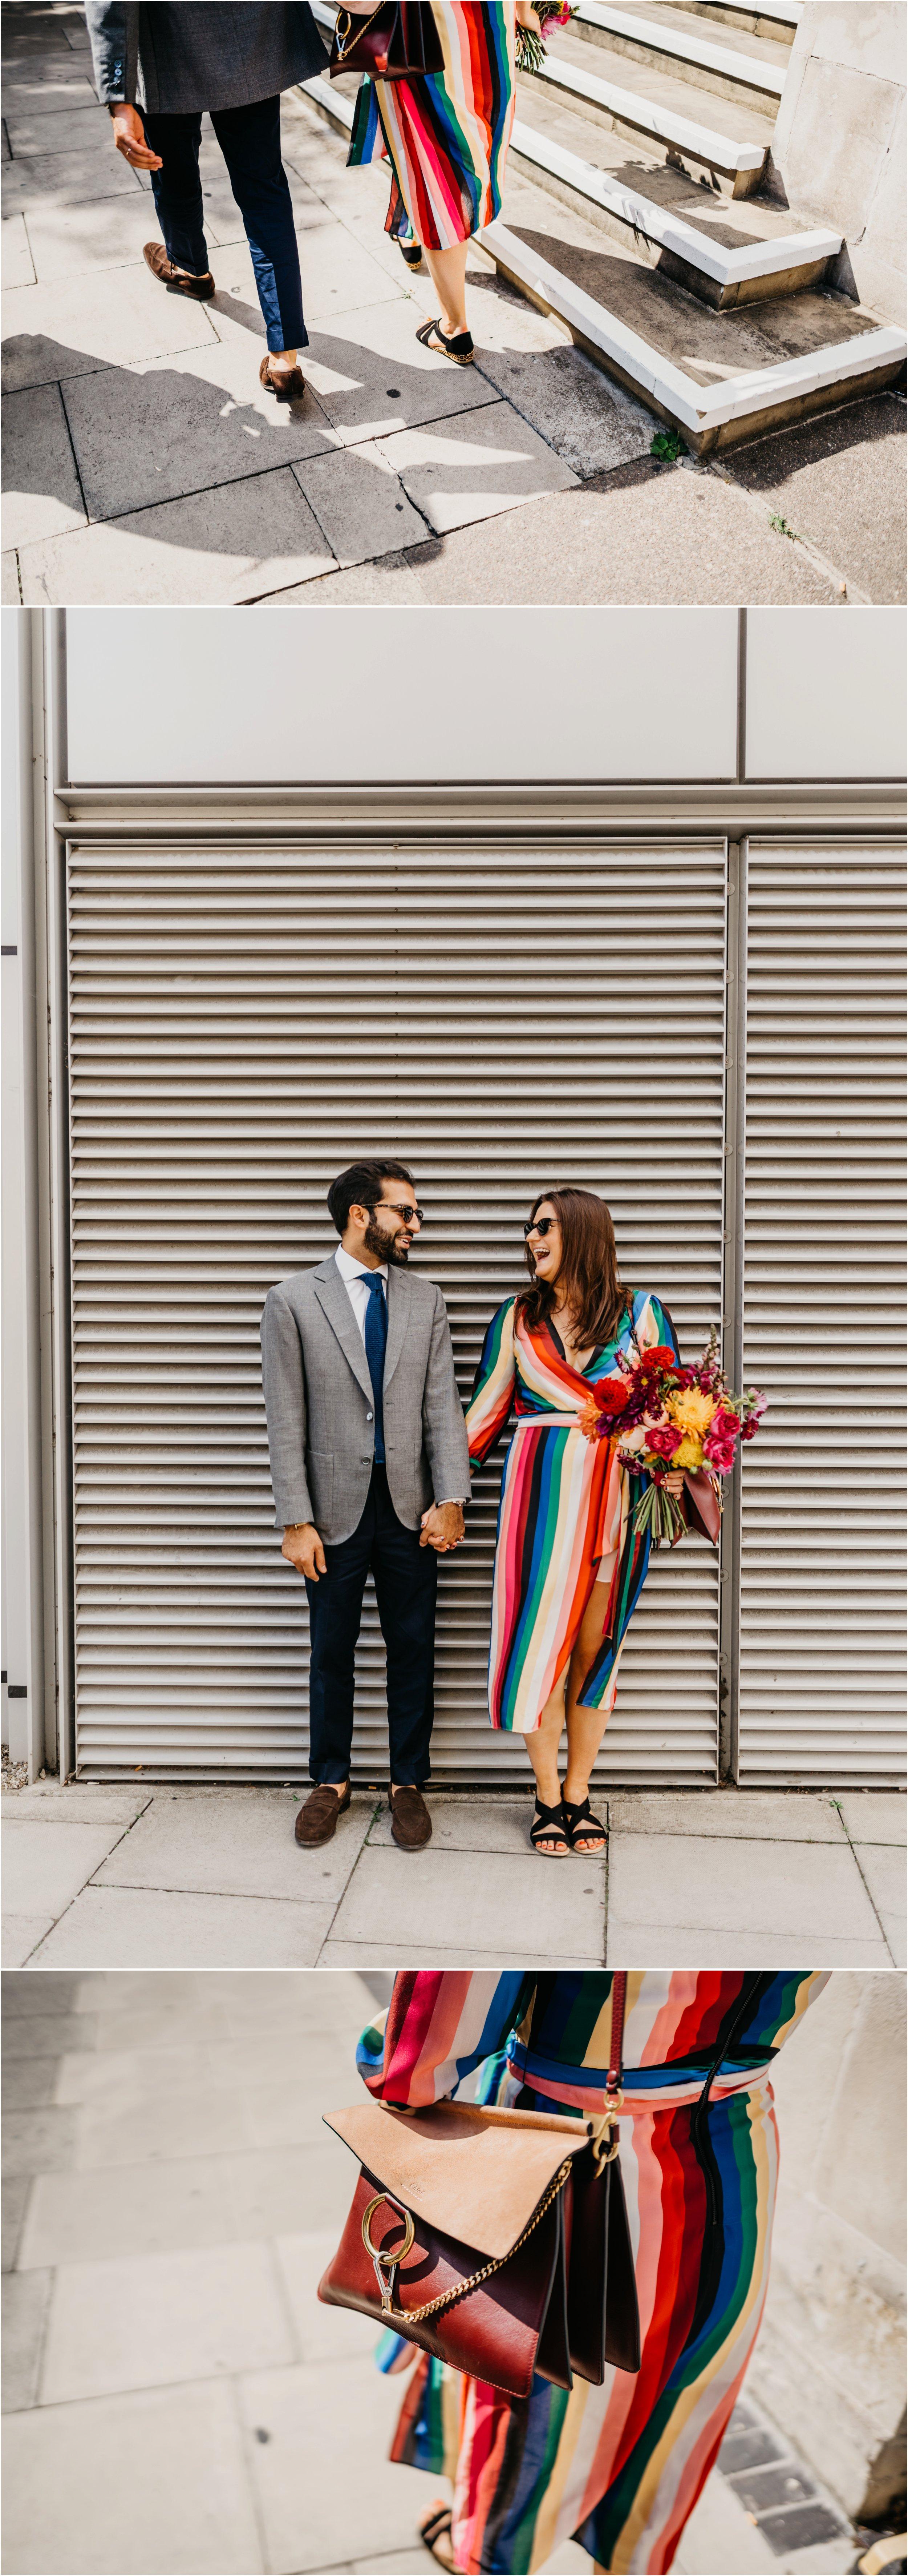 Hackney Town Hall London wedding photographer_0018.jpg